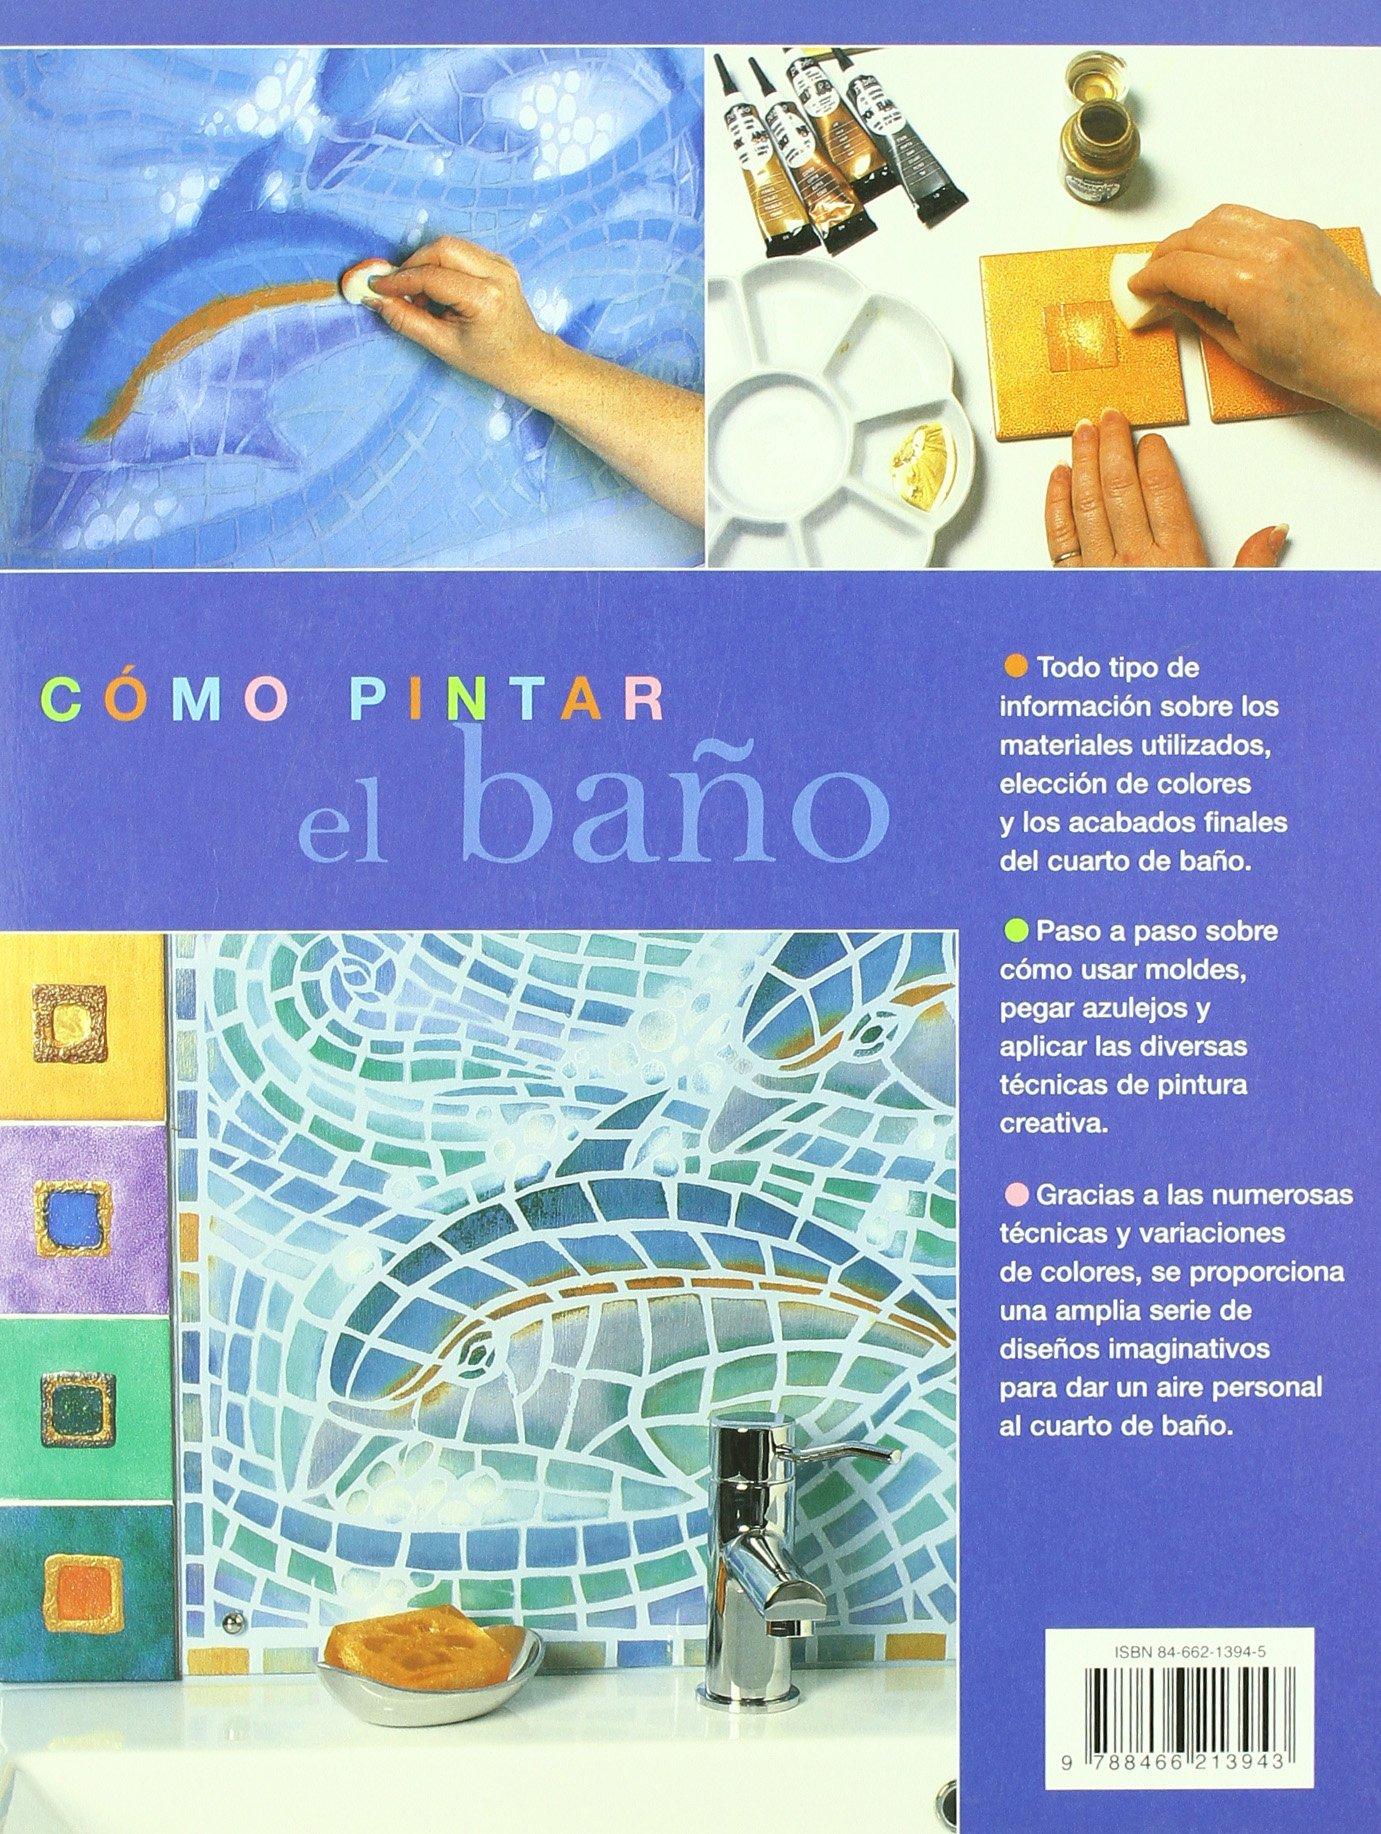 Como pintar el bano/ The Painted Bathroom (Spanish Edition): Henny Donovan: 9788466213943: Amazon.com: Books